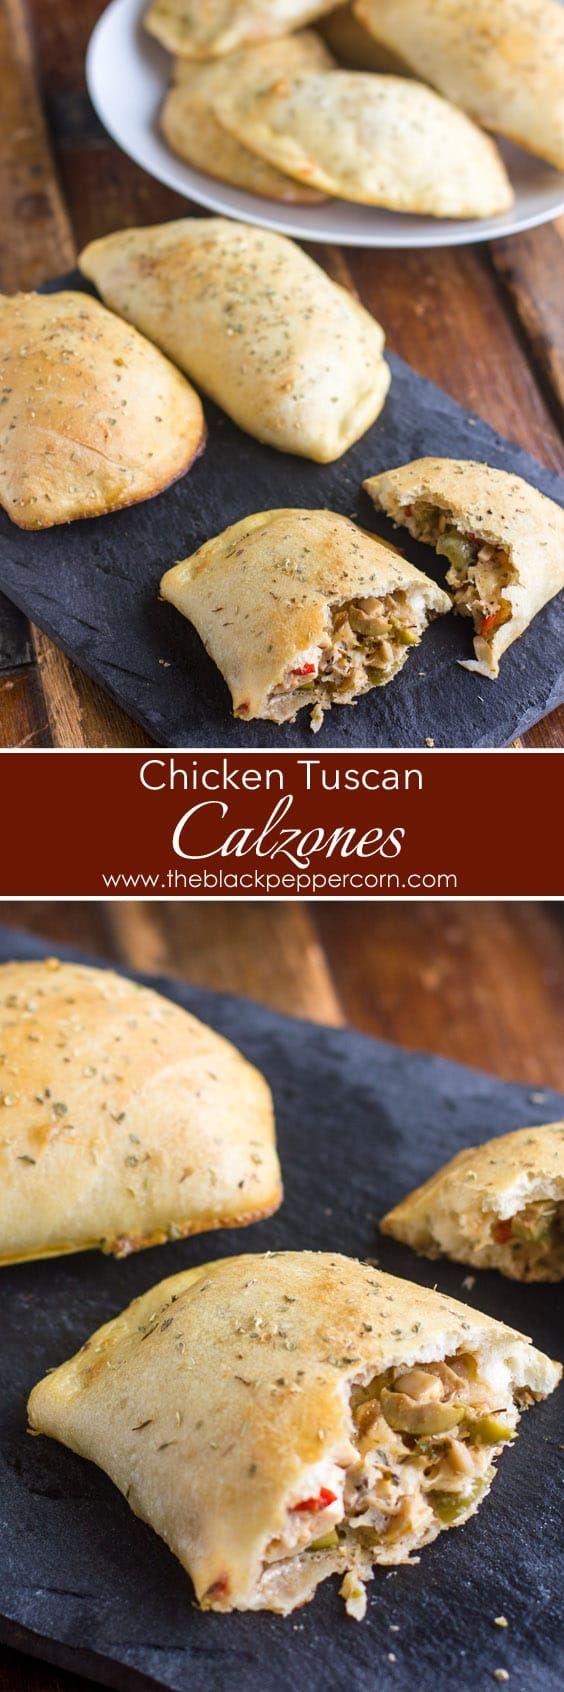 How to make Calzones - Chicken Tuscan Calzones via @blackpeppercorn